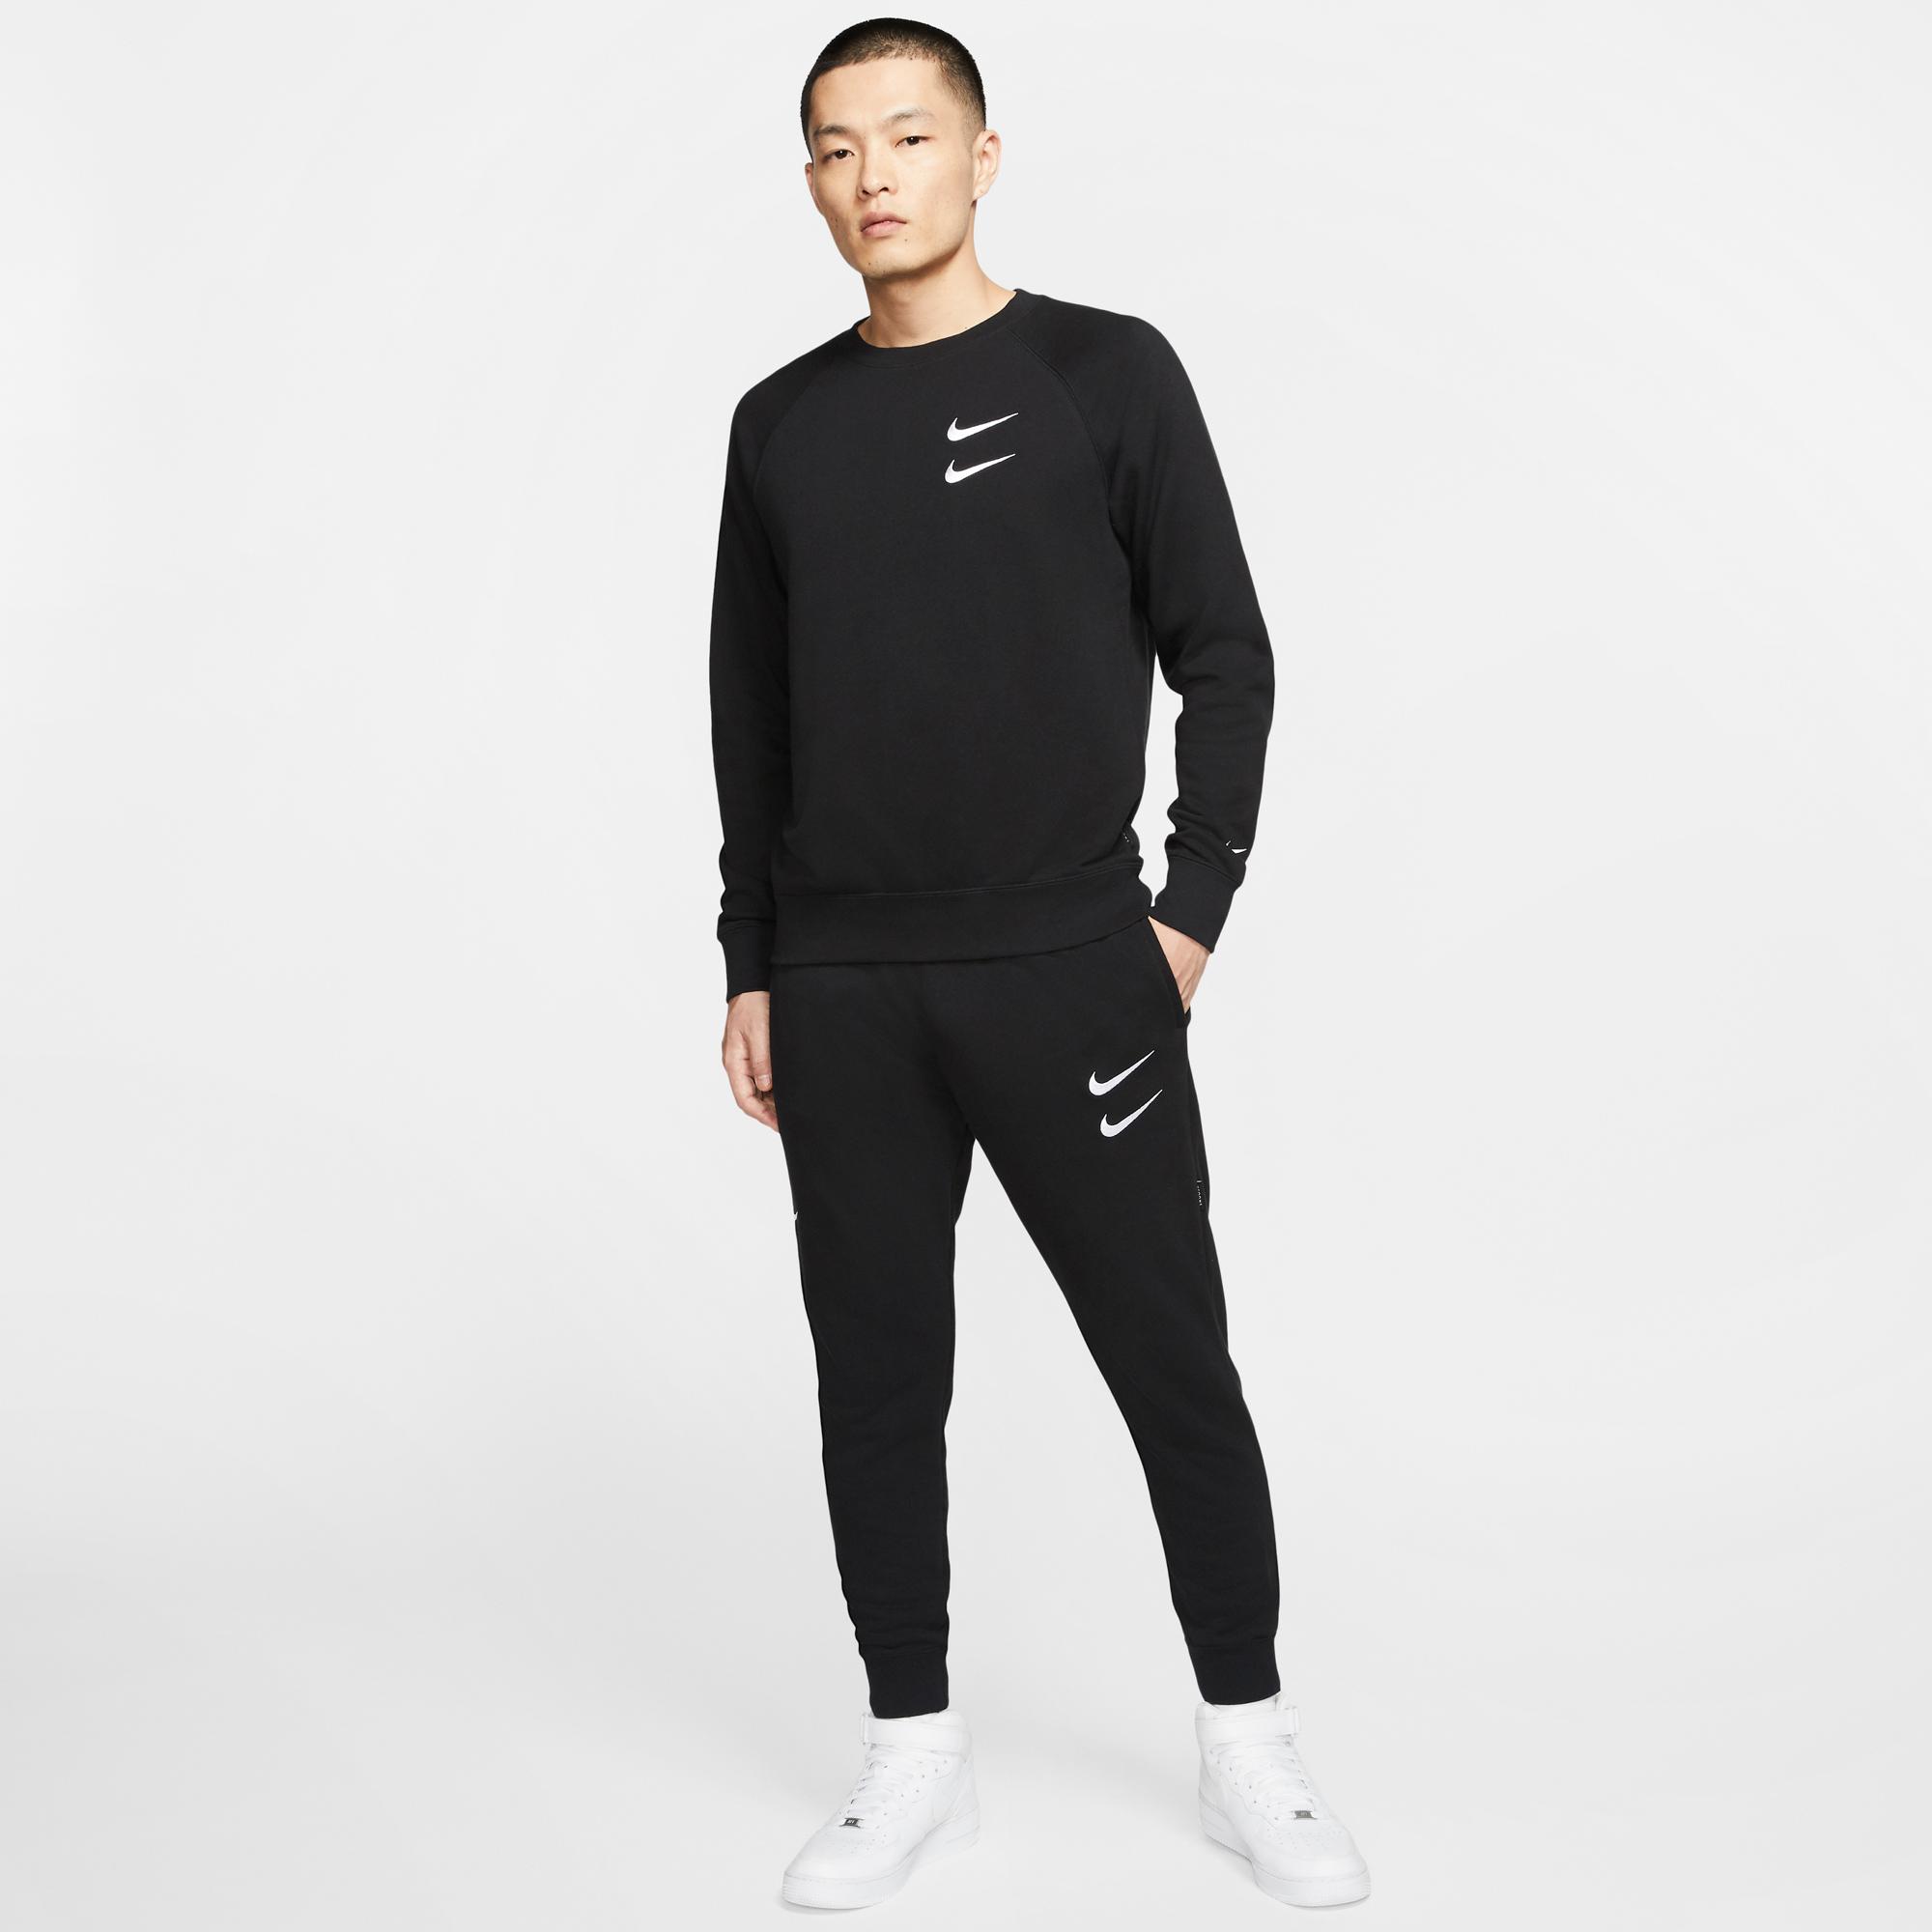 Nike Sportswear Swoosh Erkek Siyah Eşofman Altı